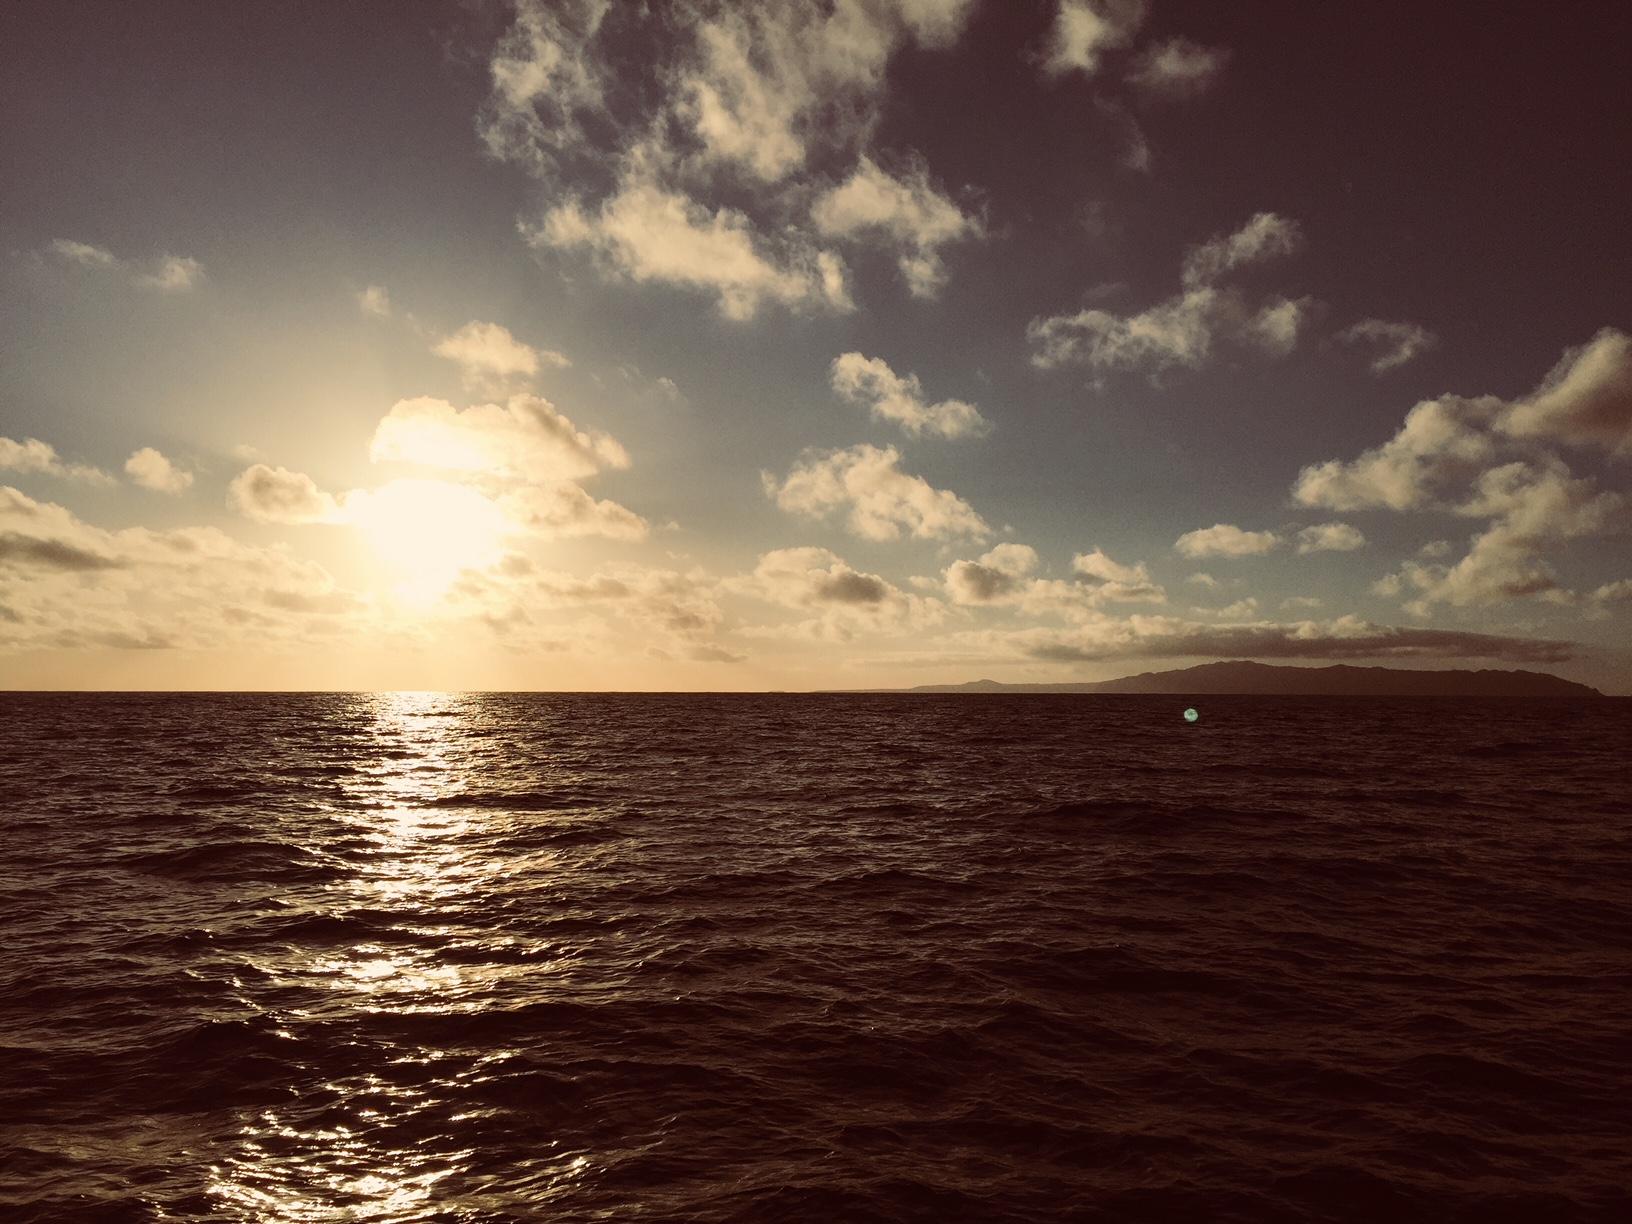 Land in Sicht. Santa Maria, Azoren.